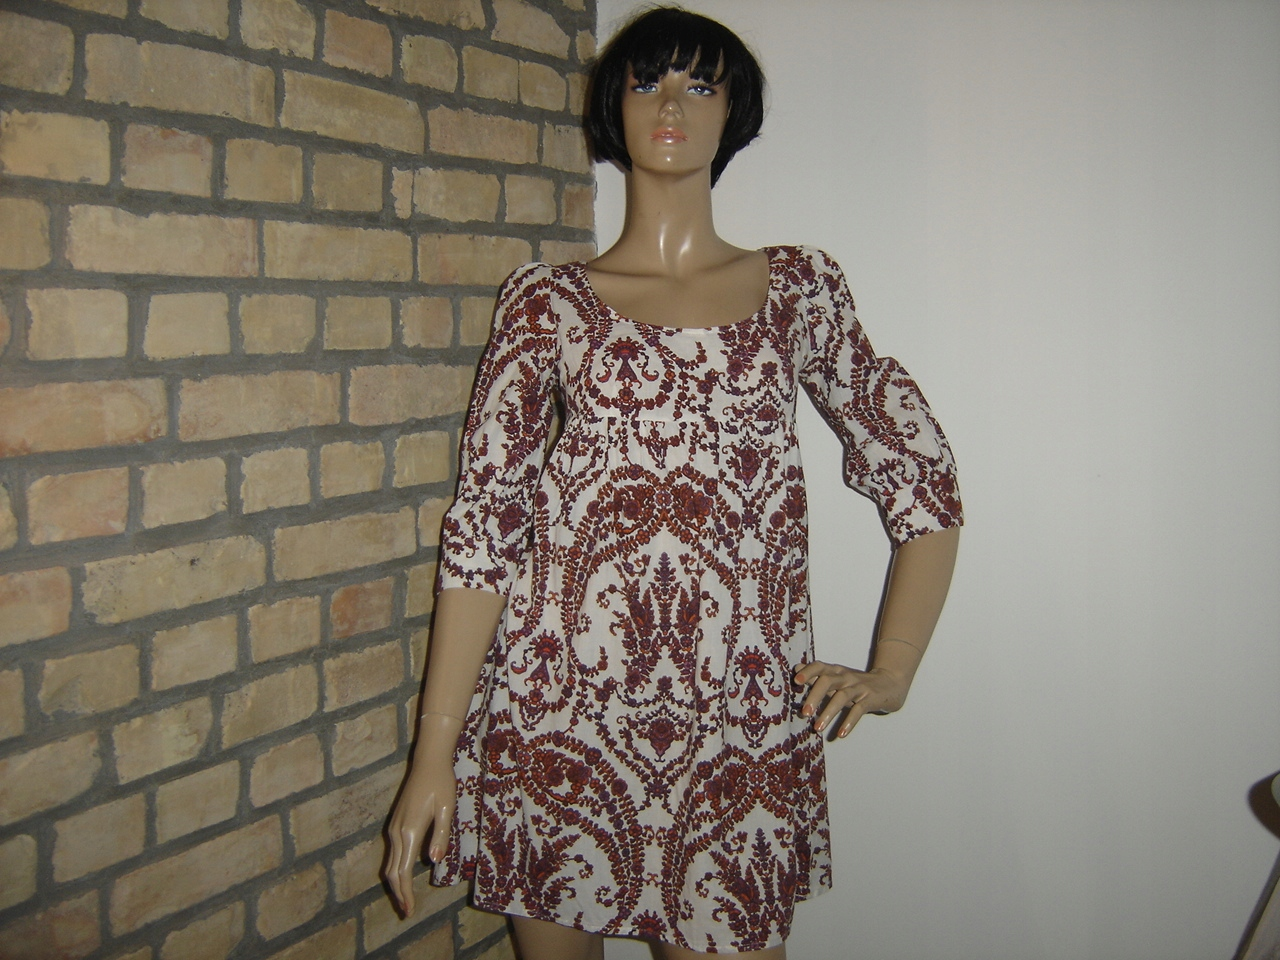 TOPSHOP biała sukienka we wzorki paisley orient 38